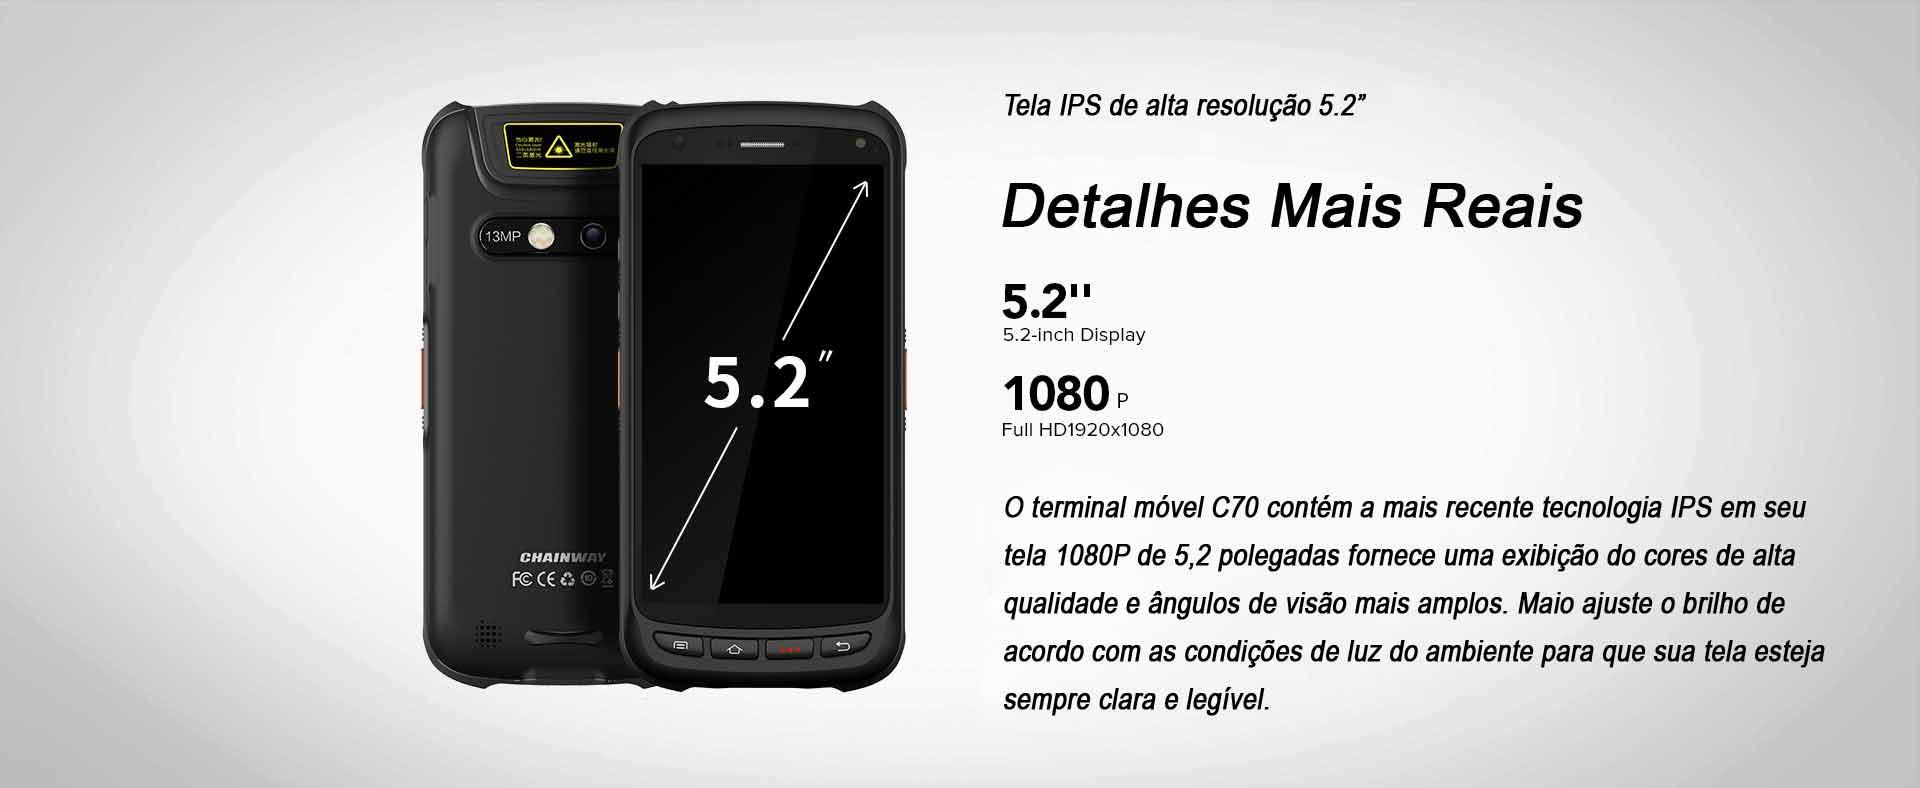 Terminal Móveis C70 Chainway Android